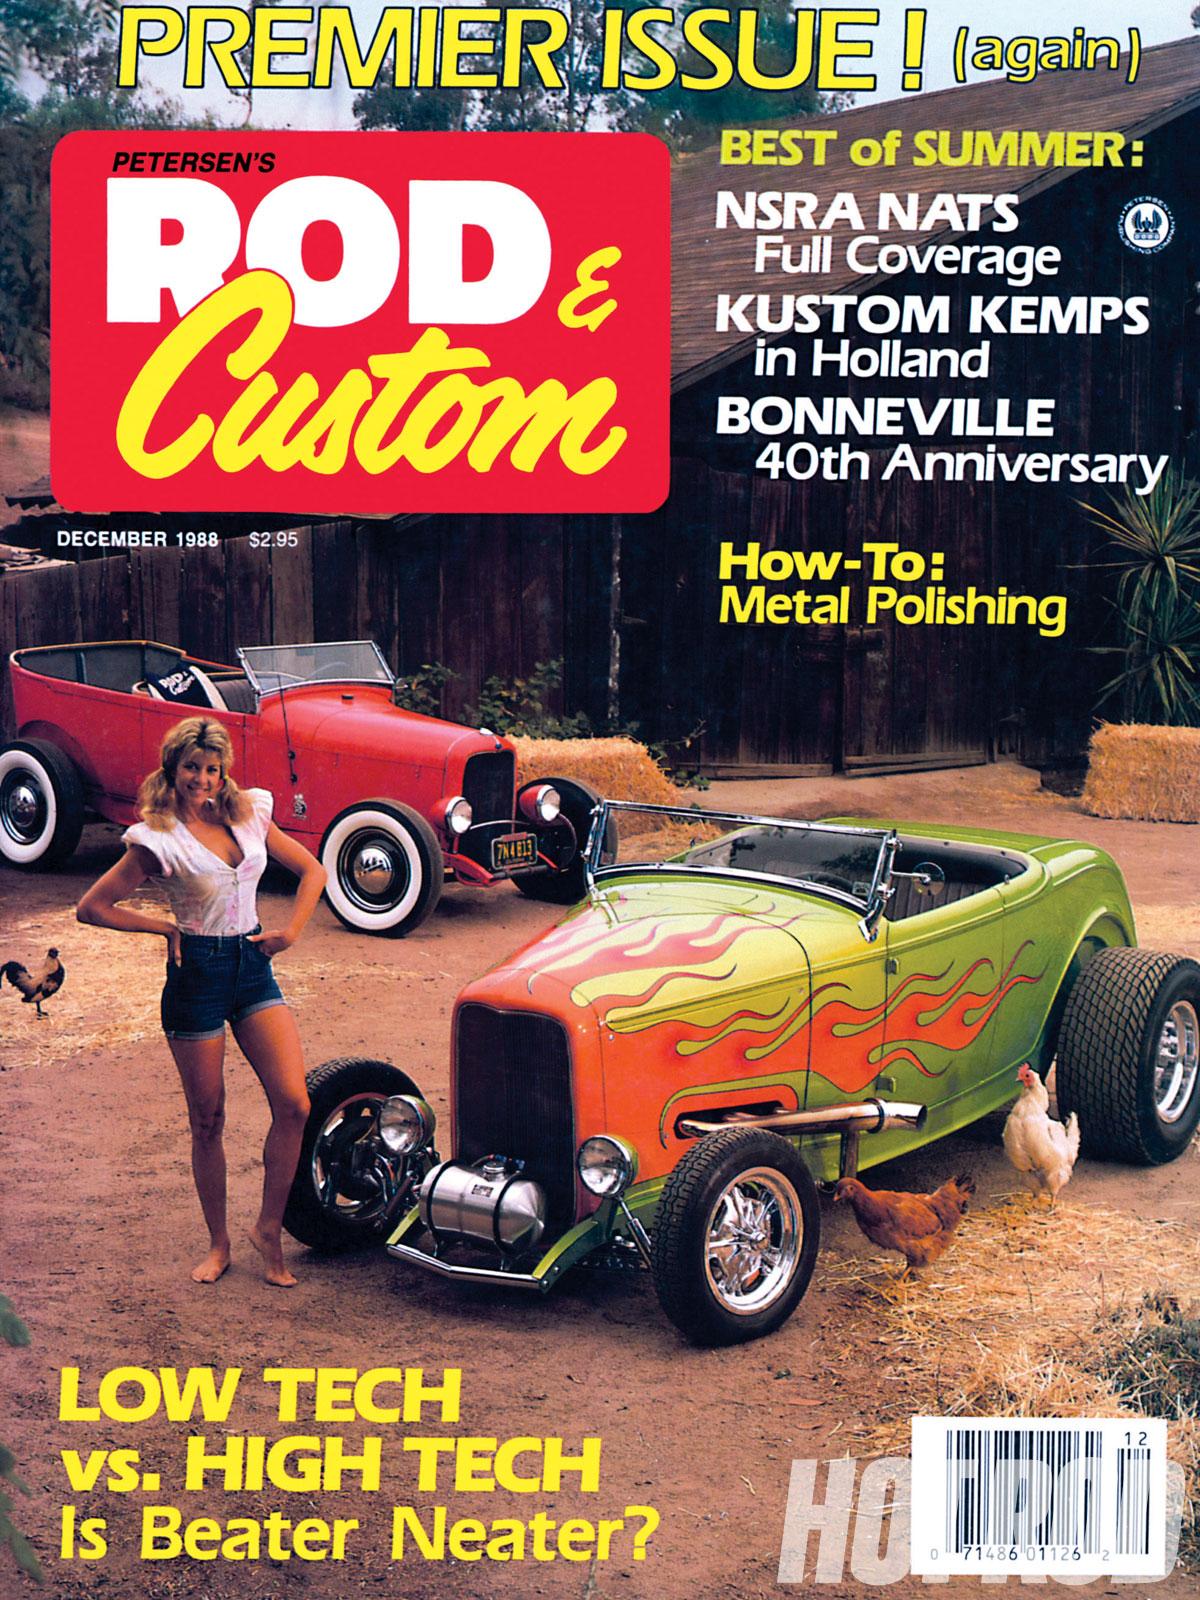 hrdp_1011_07_o%2Brat_rod_history%2Bdecember_1988_rod_and_custom.jpg